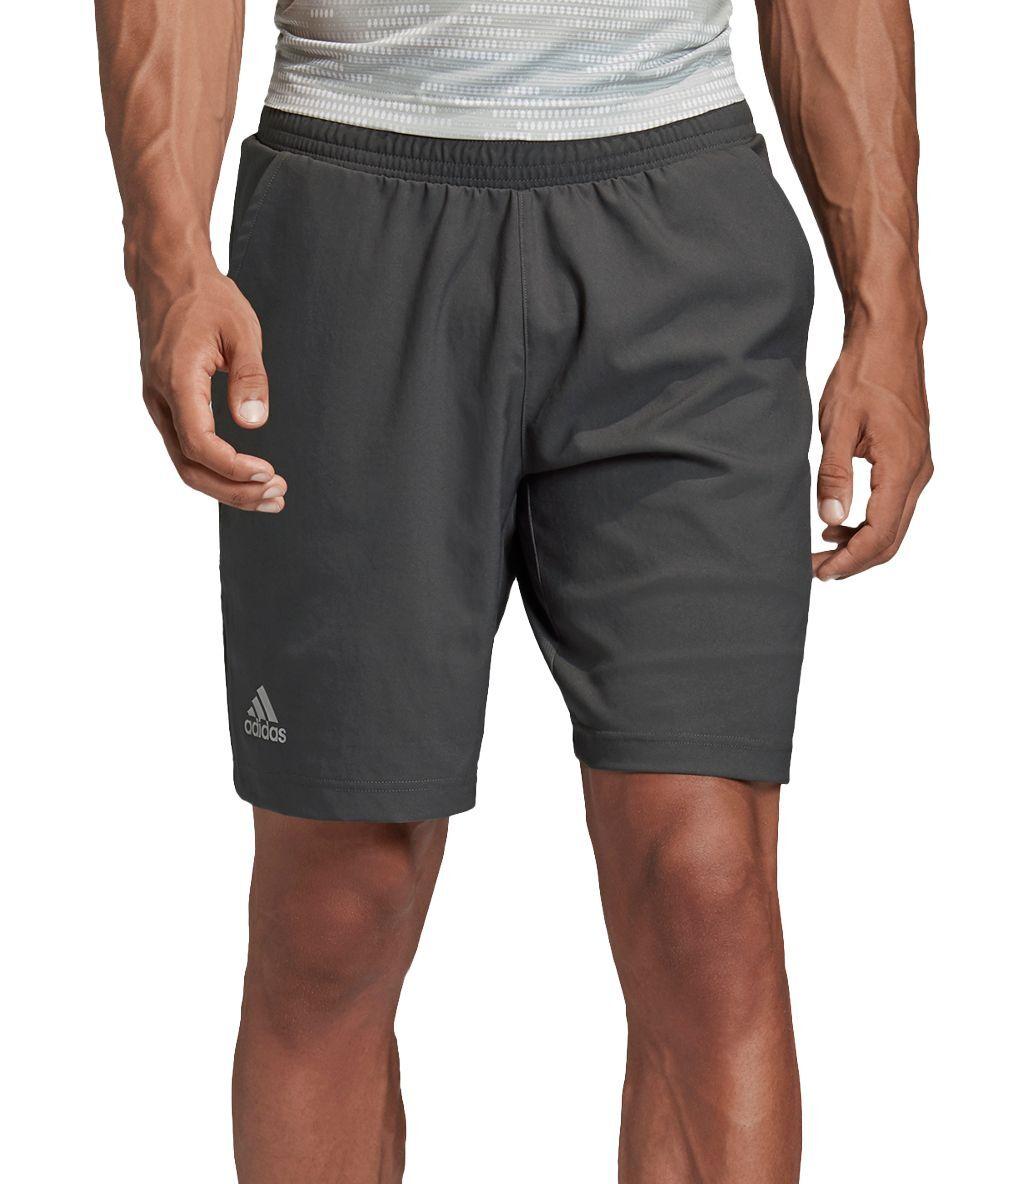 adidas Men's Primeblue Tennis Shorts, Small, Gray